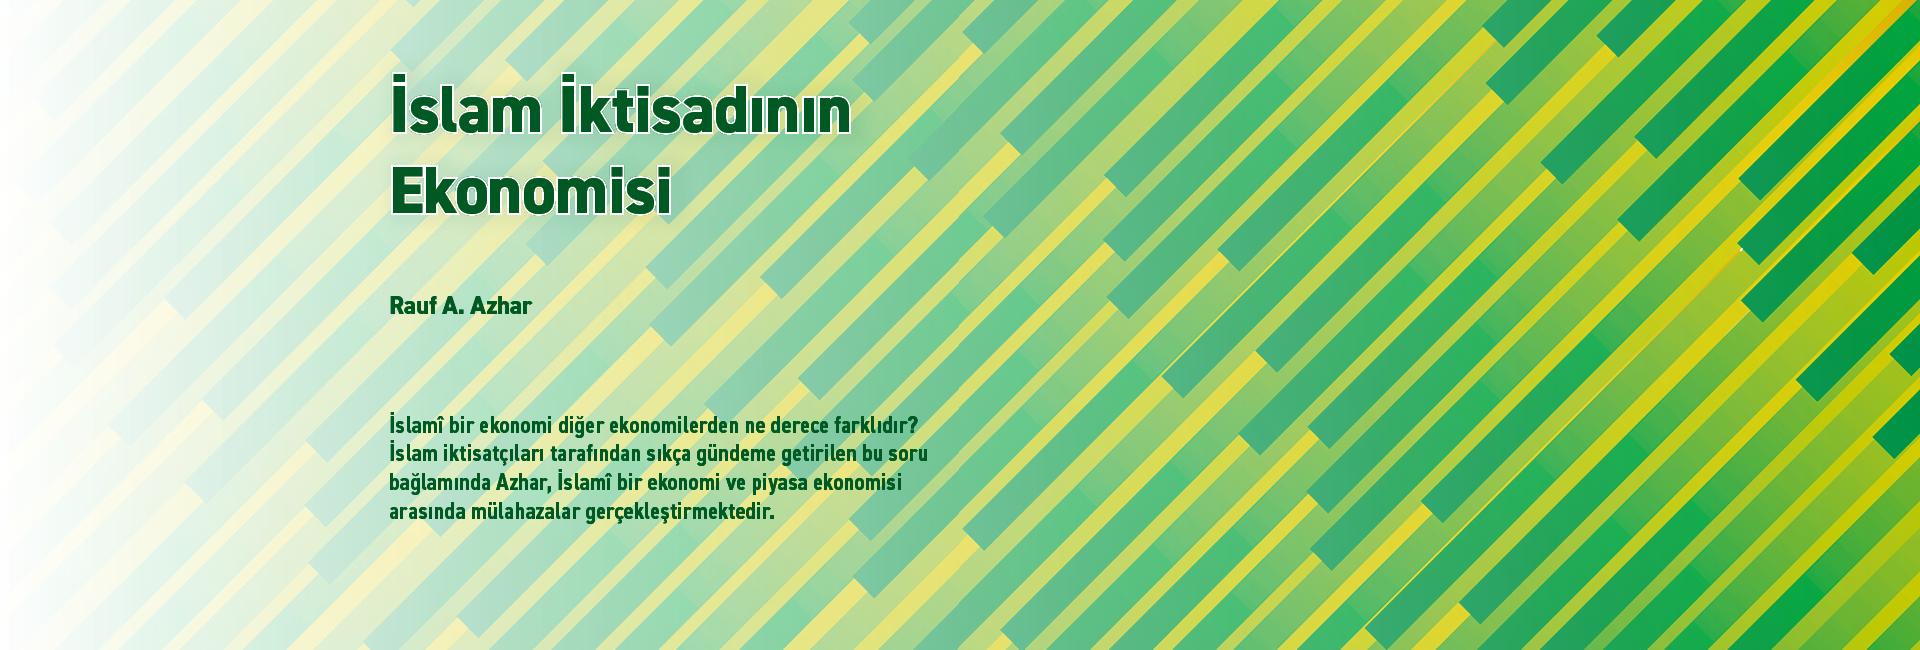 http://www.iktisatyayinlari.com/content/1-home/iiekonomisi_web.jpg